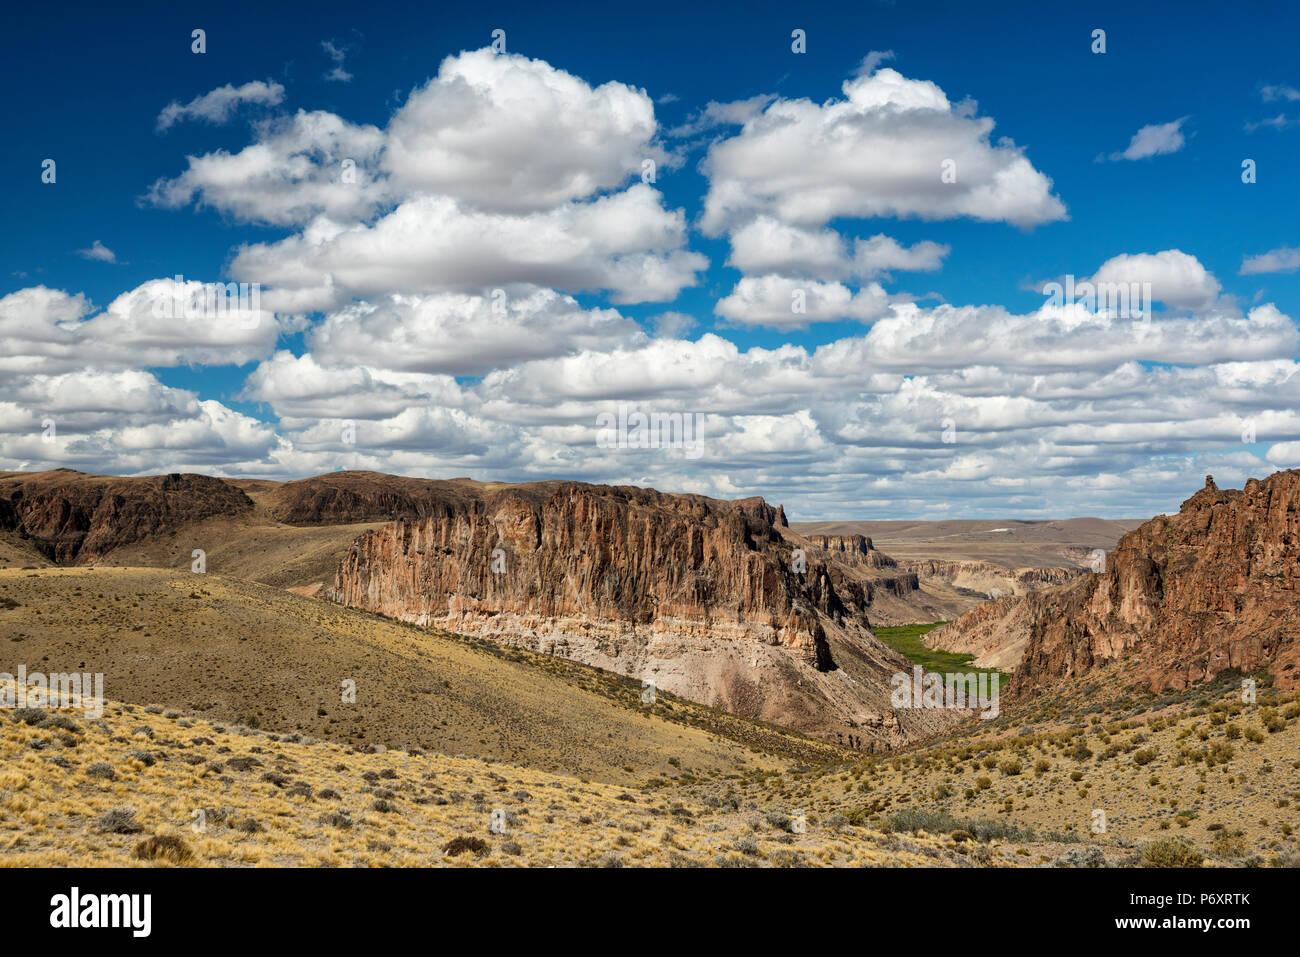 L'Amérique du Sud, Argentine, Patagonie, Santa Cruz, Cueva de los Manos landscape Photo Stock